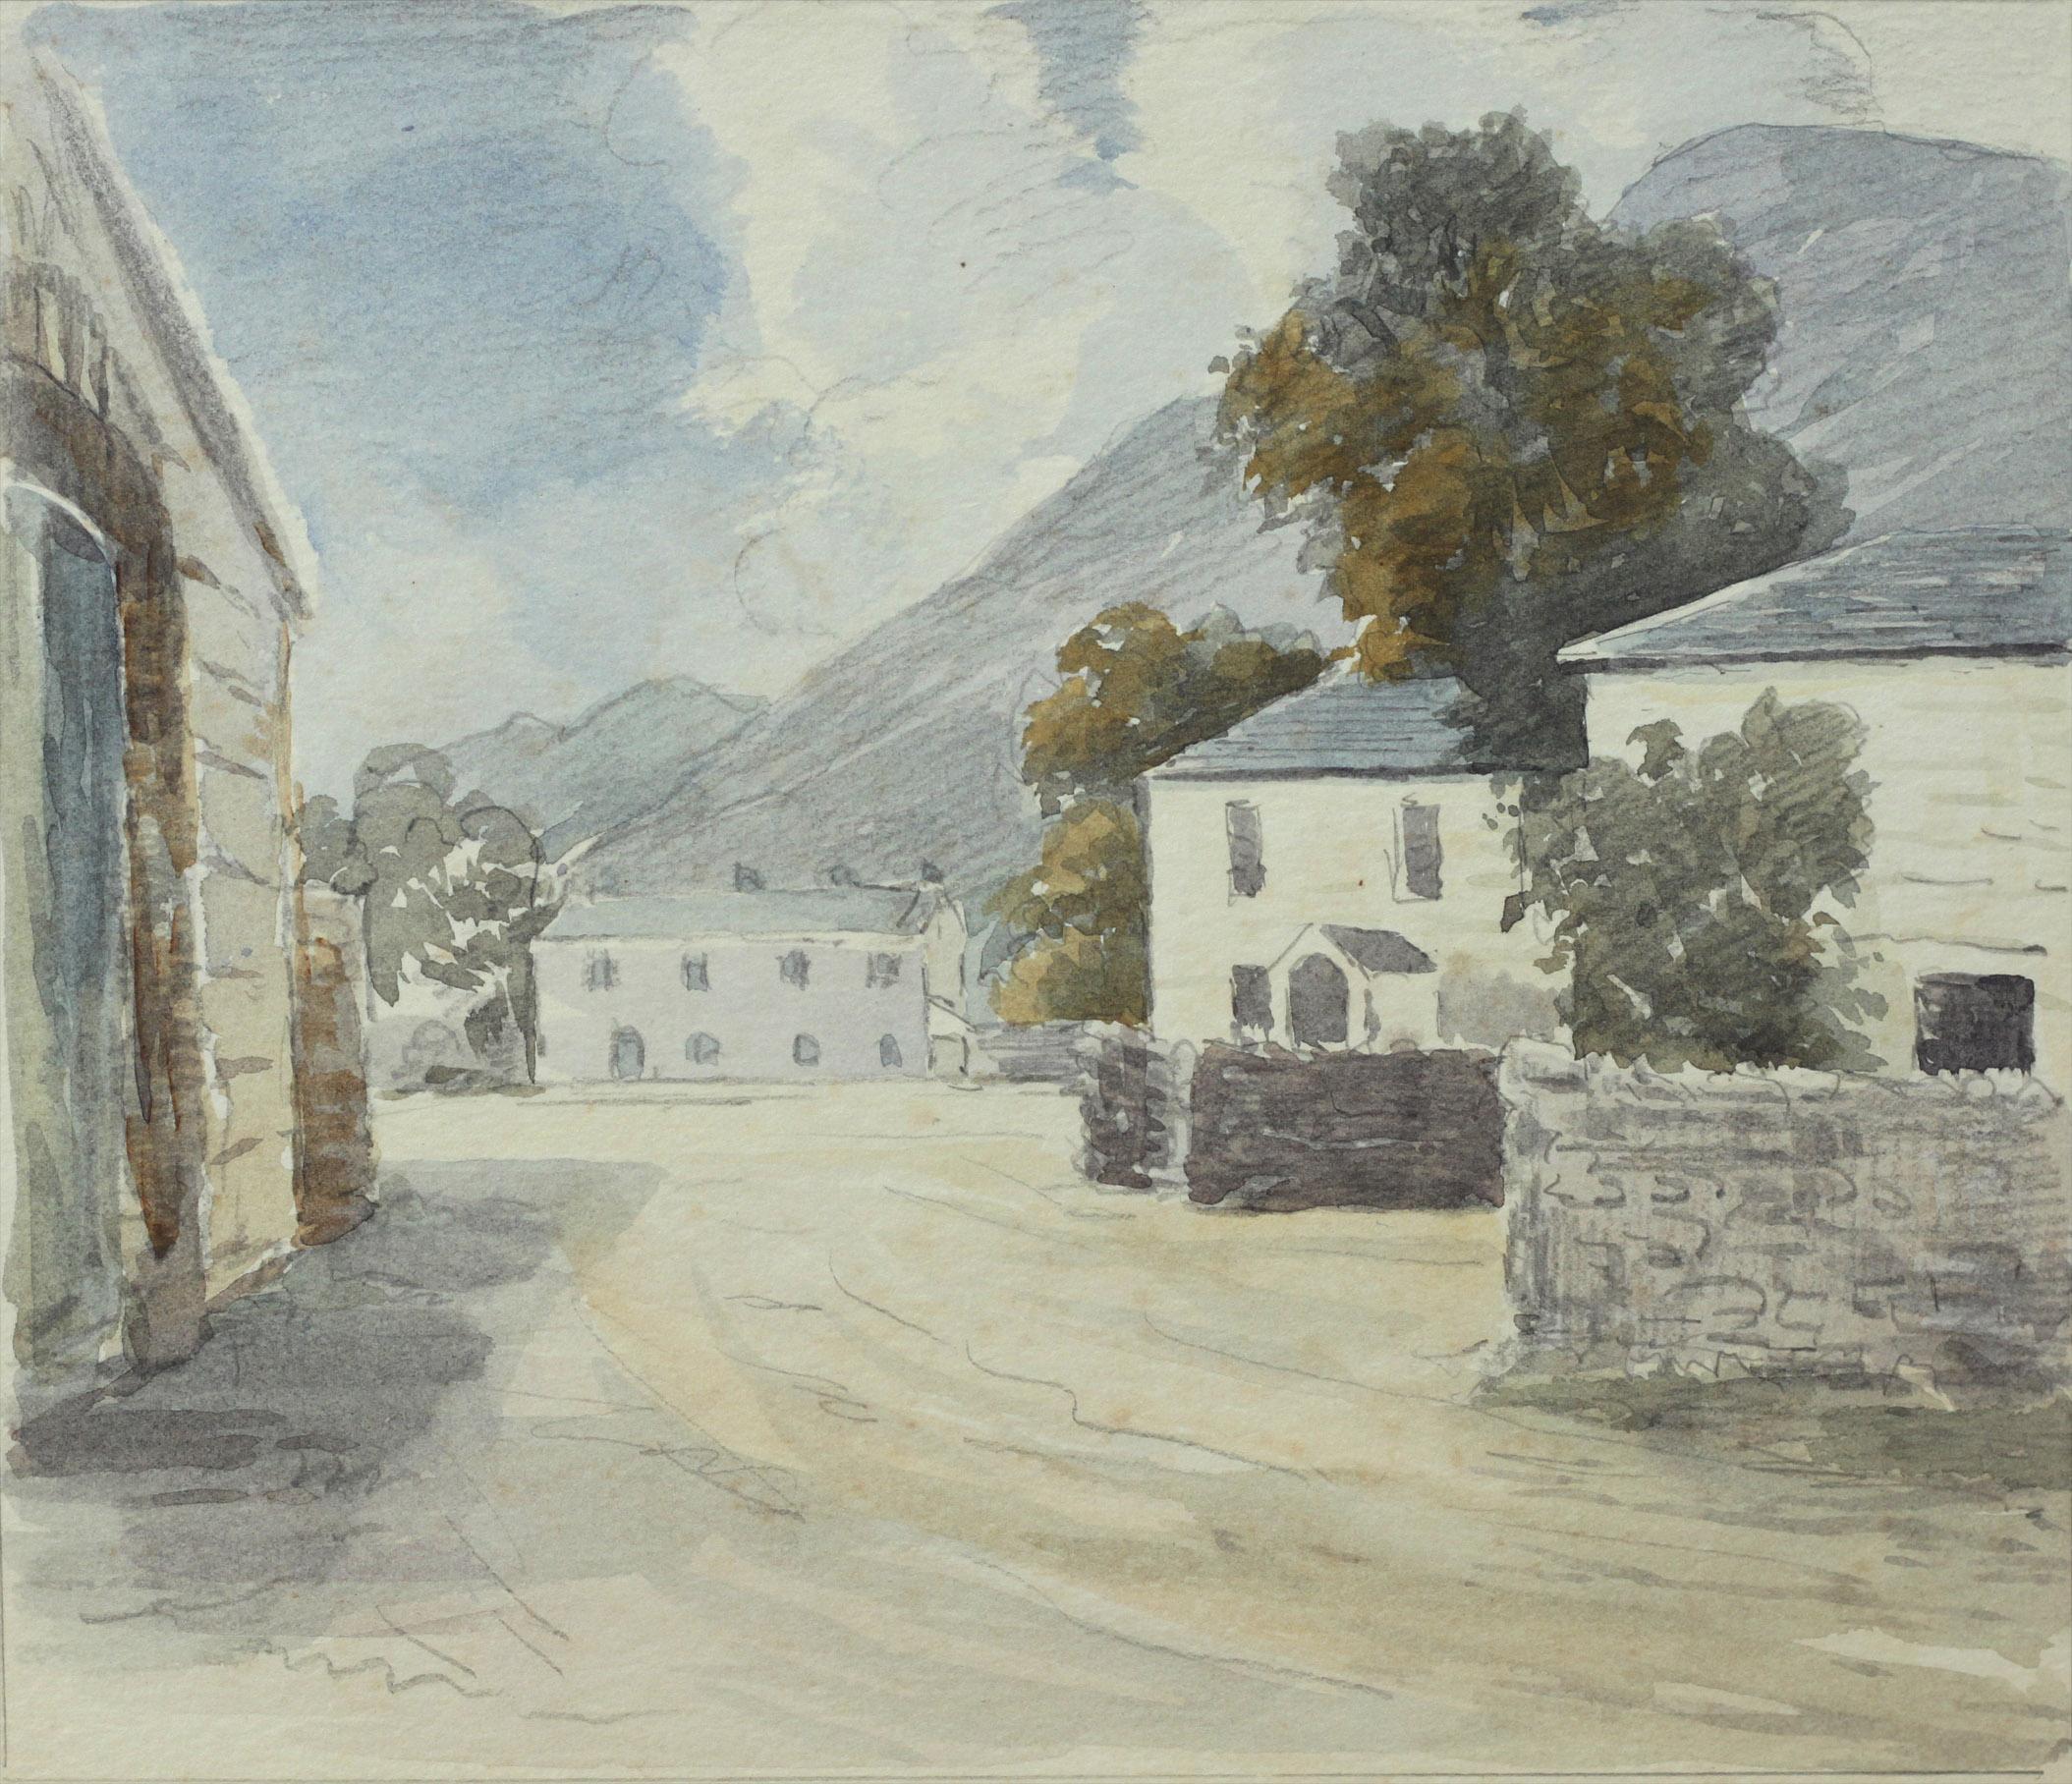 Click to see full size: Watercolour of Lake District village by Reuben Ward Binks (English, 1880-1950)- Watercolour of Lake District village by Reuben Ward Binks (English, 1880-1950)